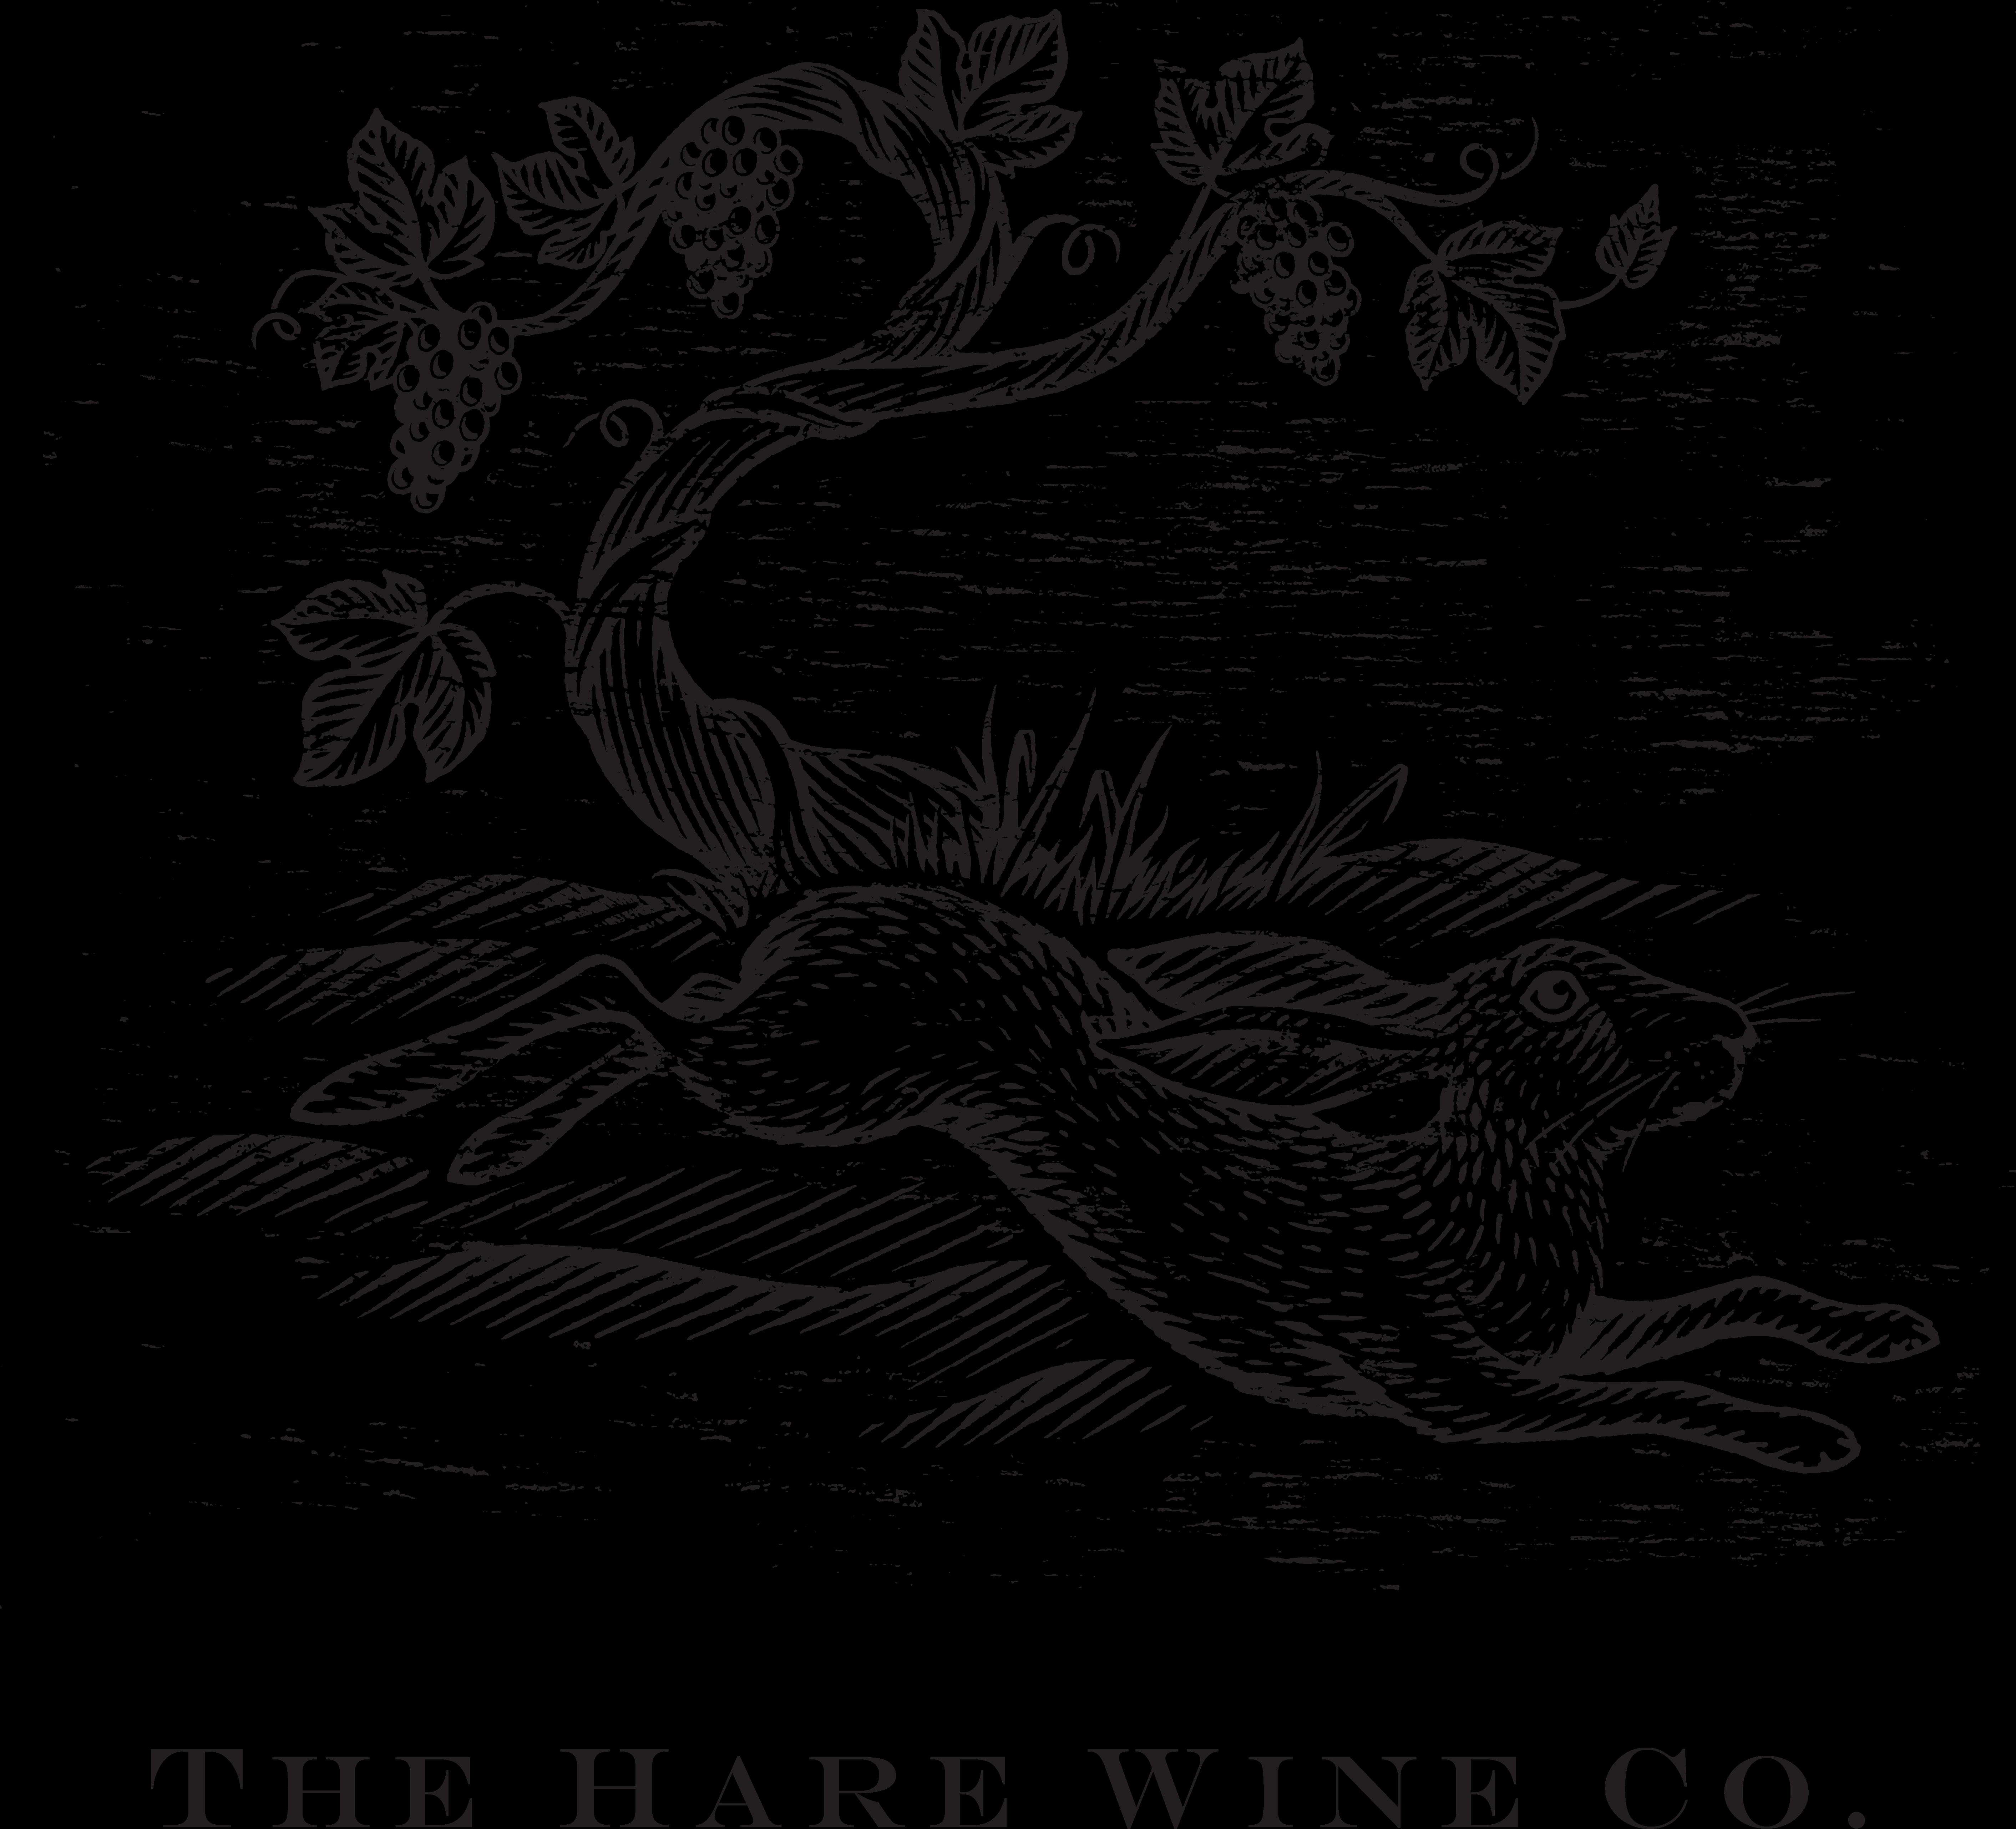 Hare Wine Co. logo